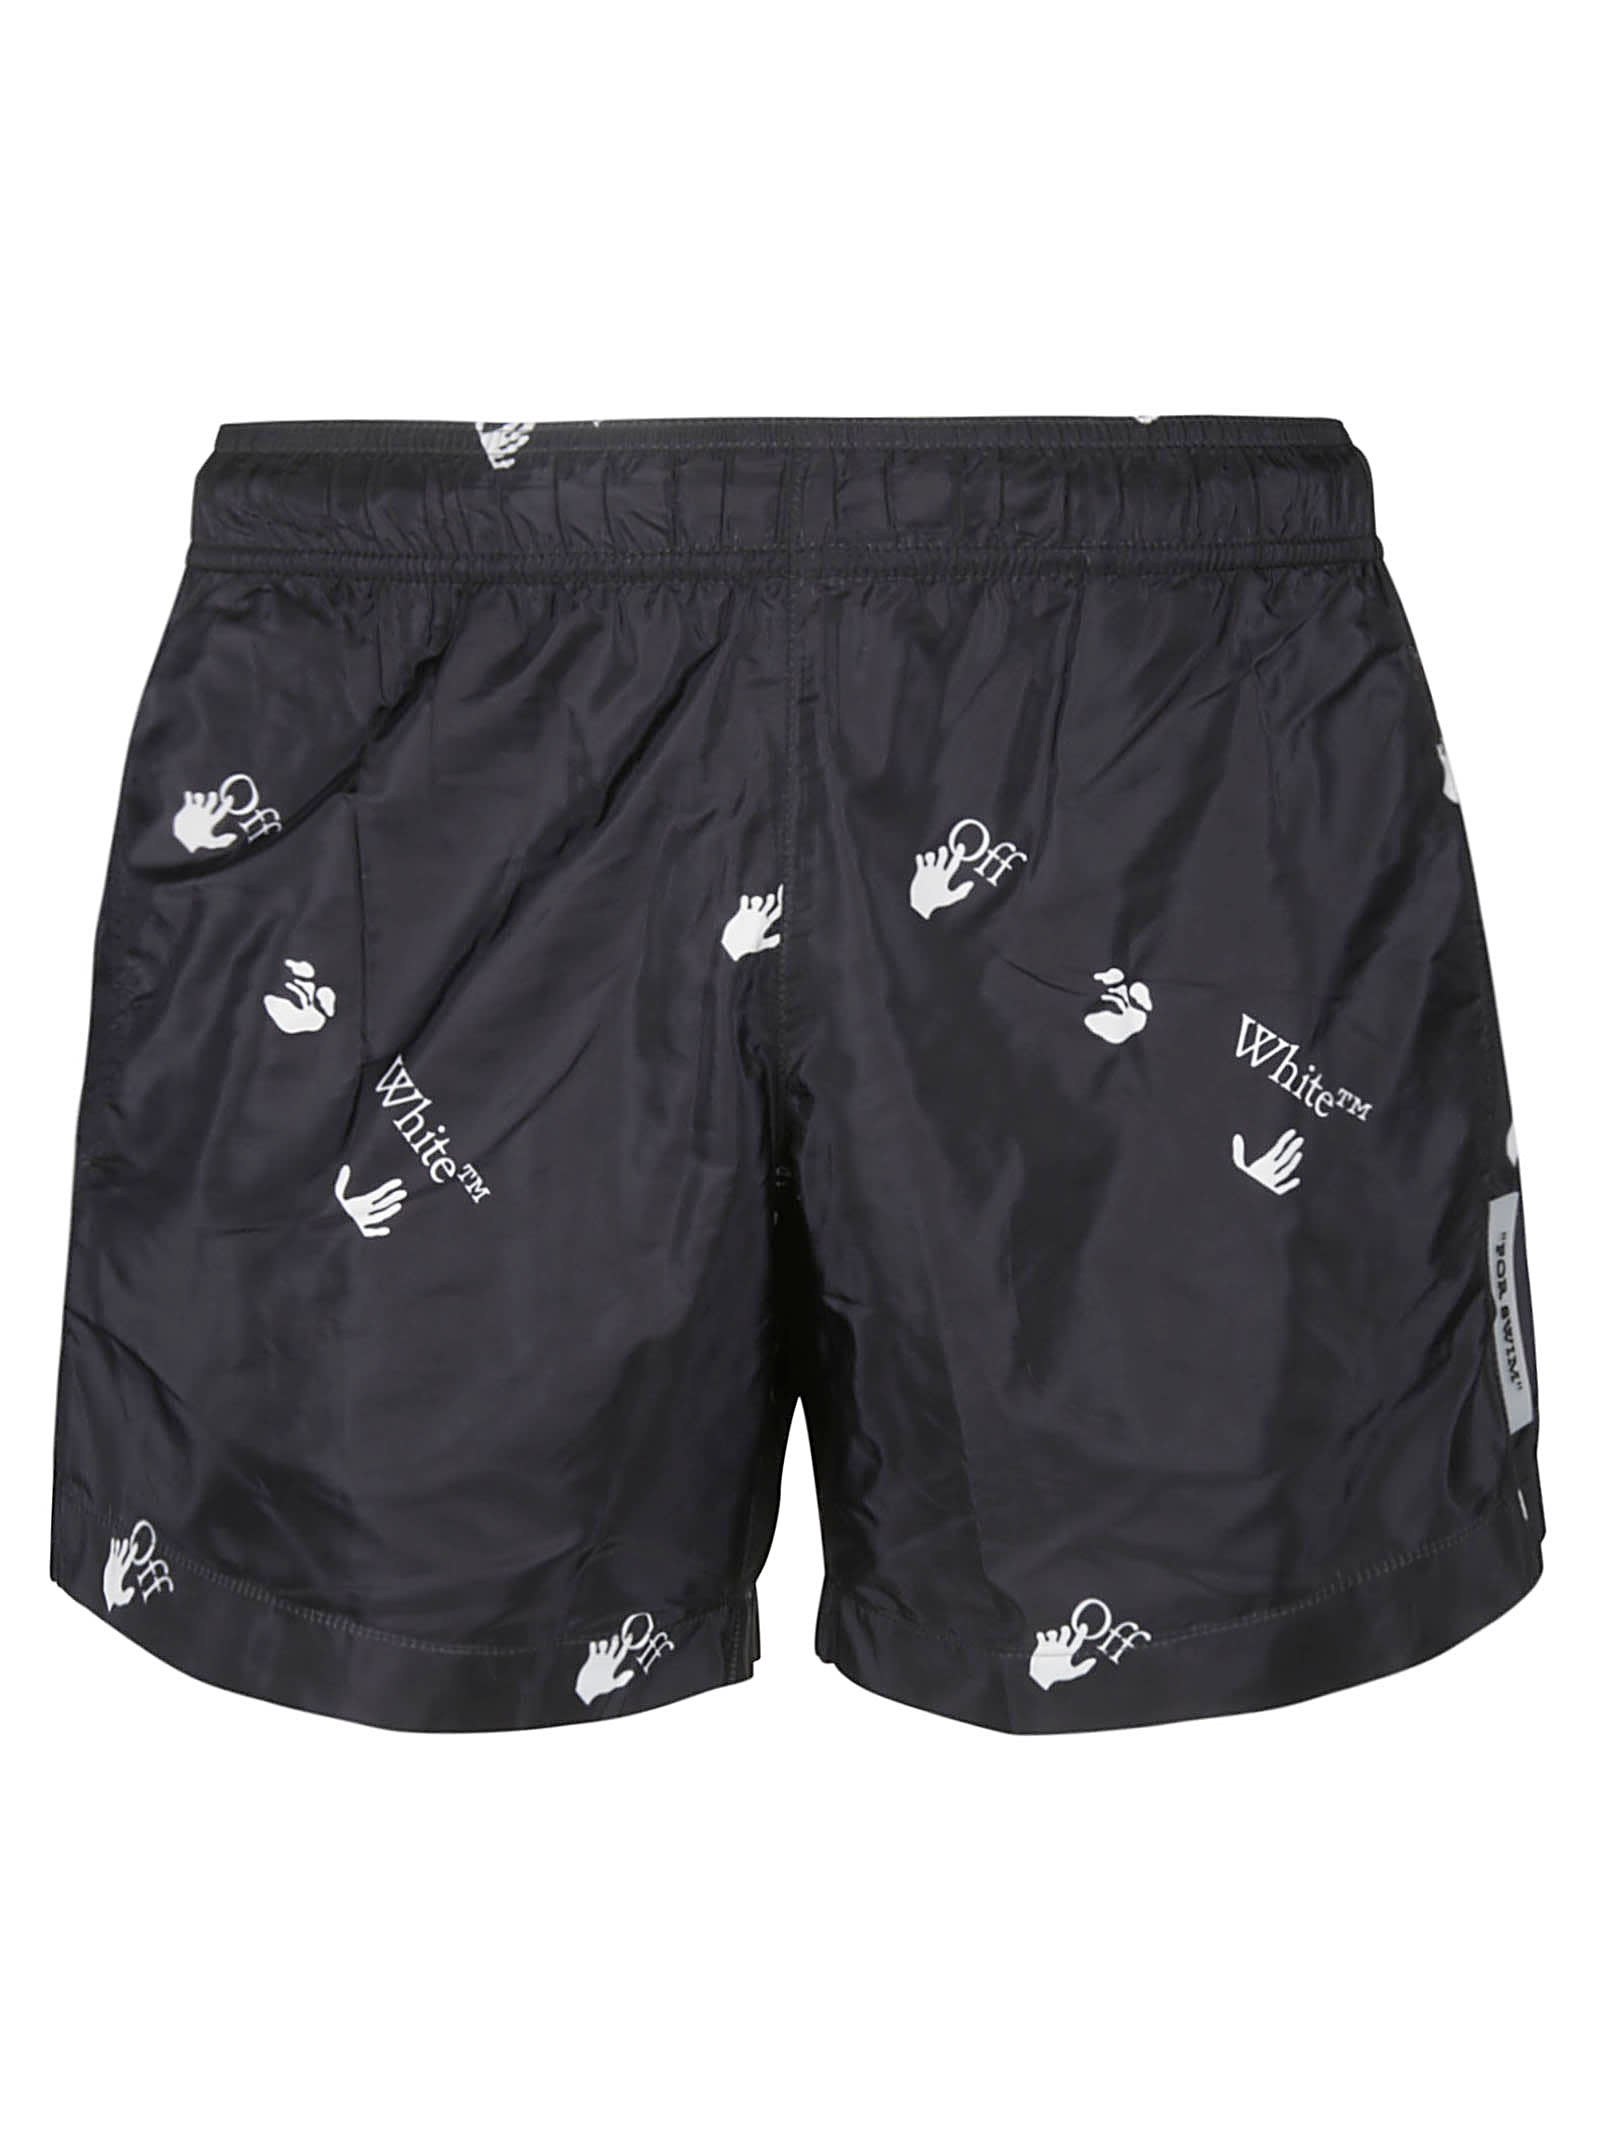 Ow Allover Swim Shorts